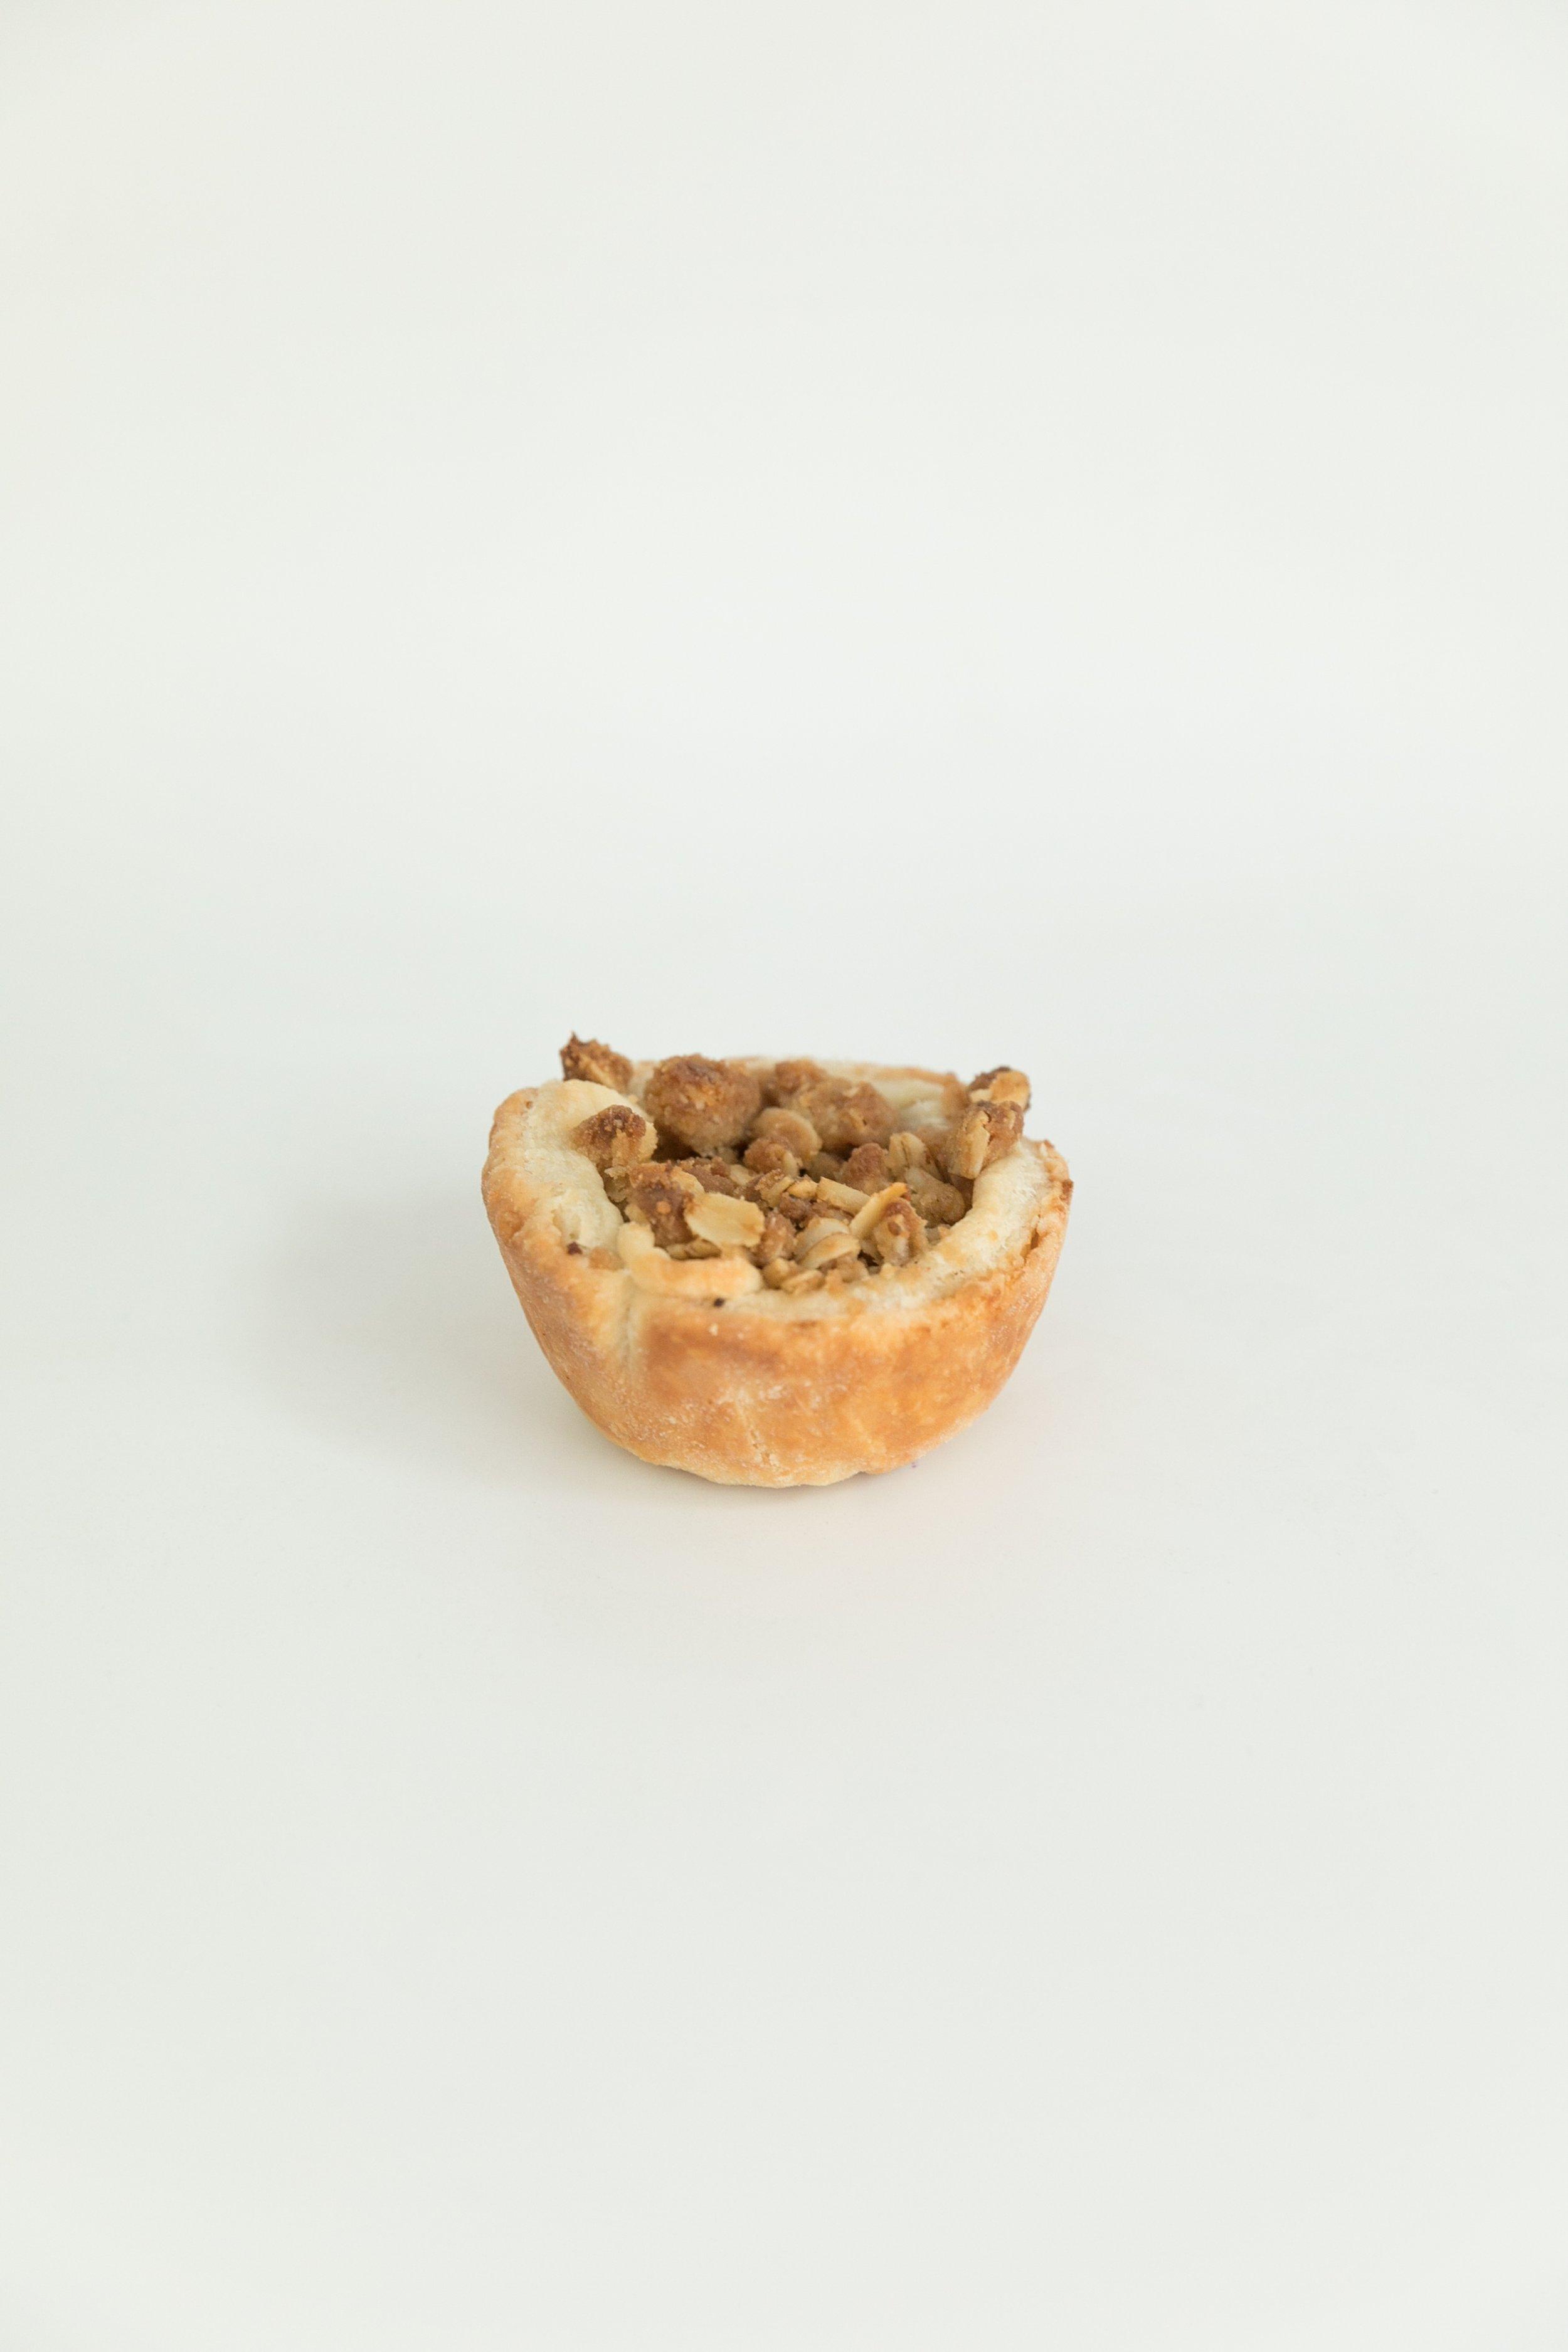 Mini dutch apple pie with brown sugar crumb topping